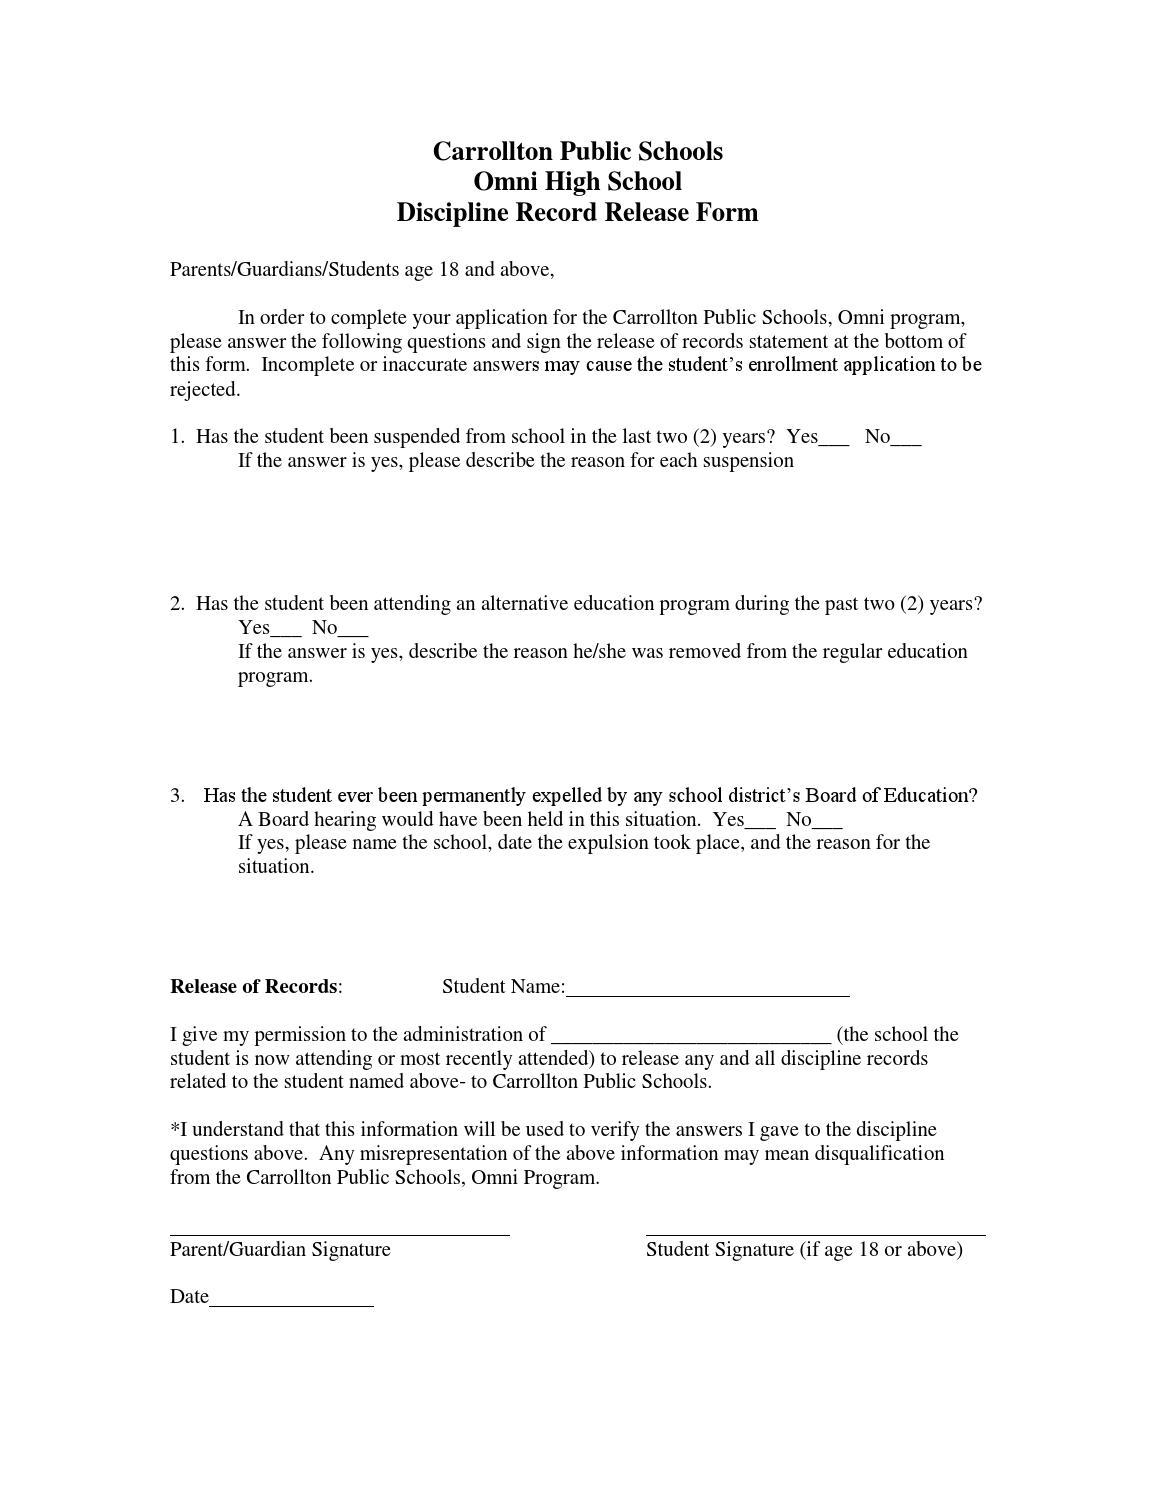 Discipline Release Form By Carrollton Public Schools Issuu